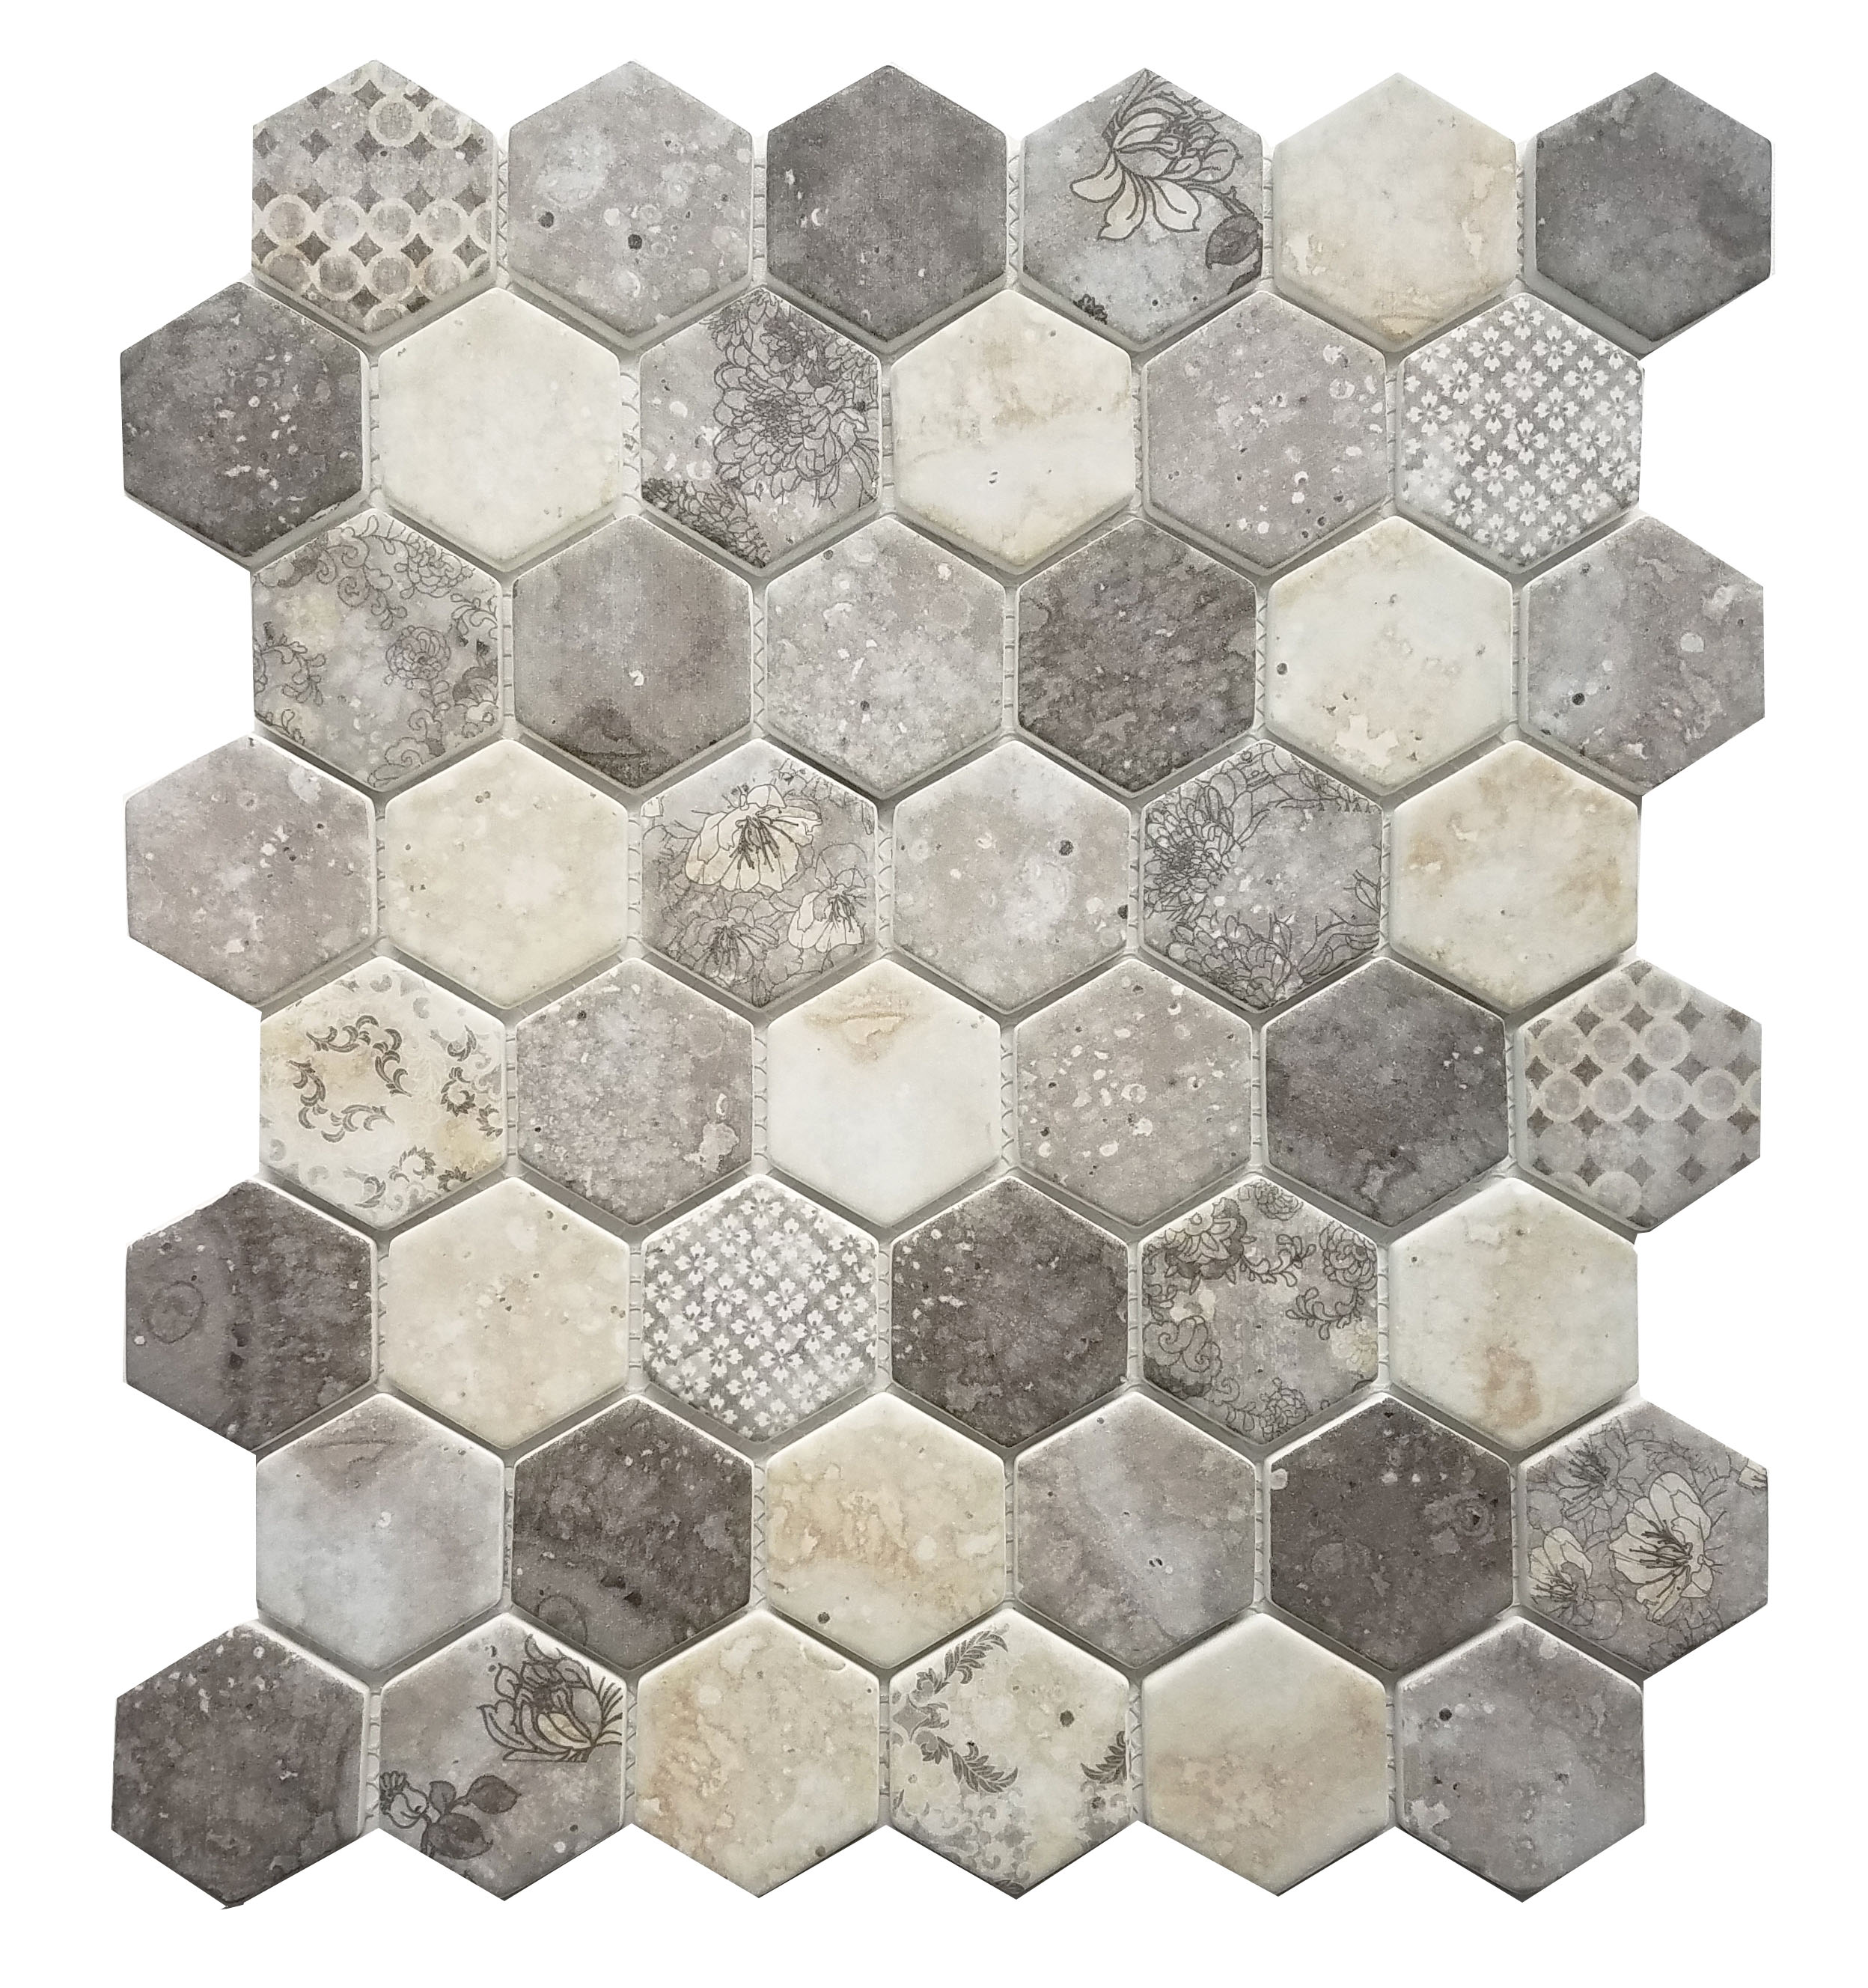 MA102-HX  2 x 2 Hexagon High density recycle glass